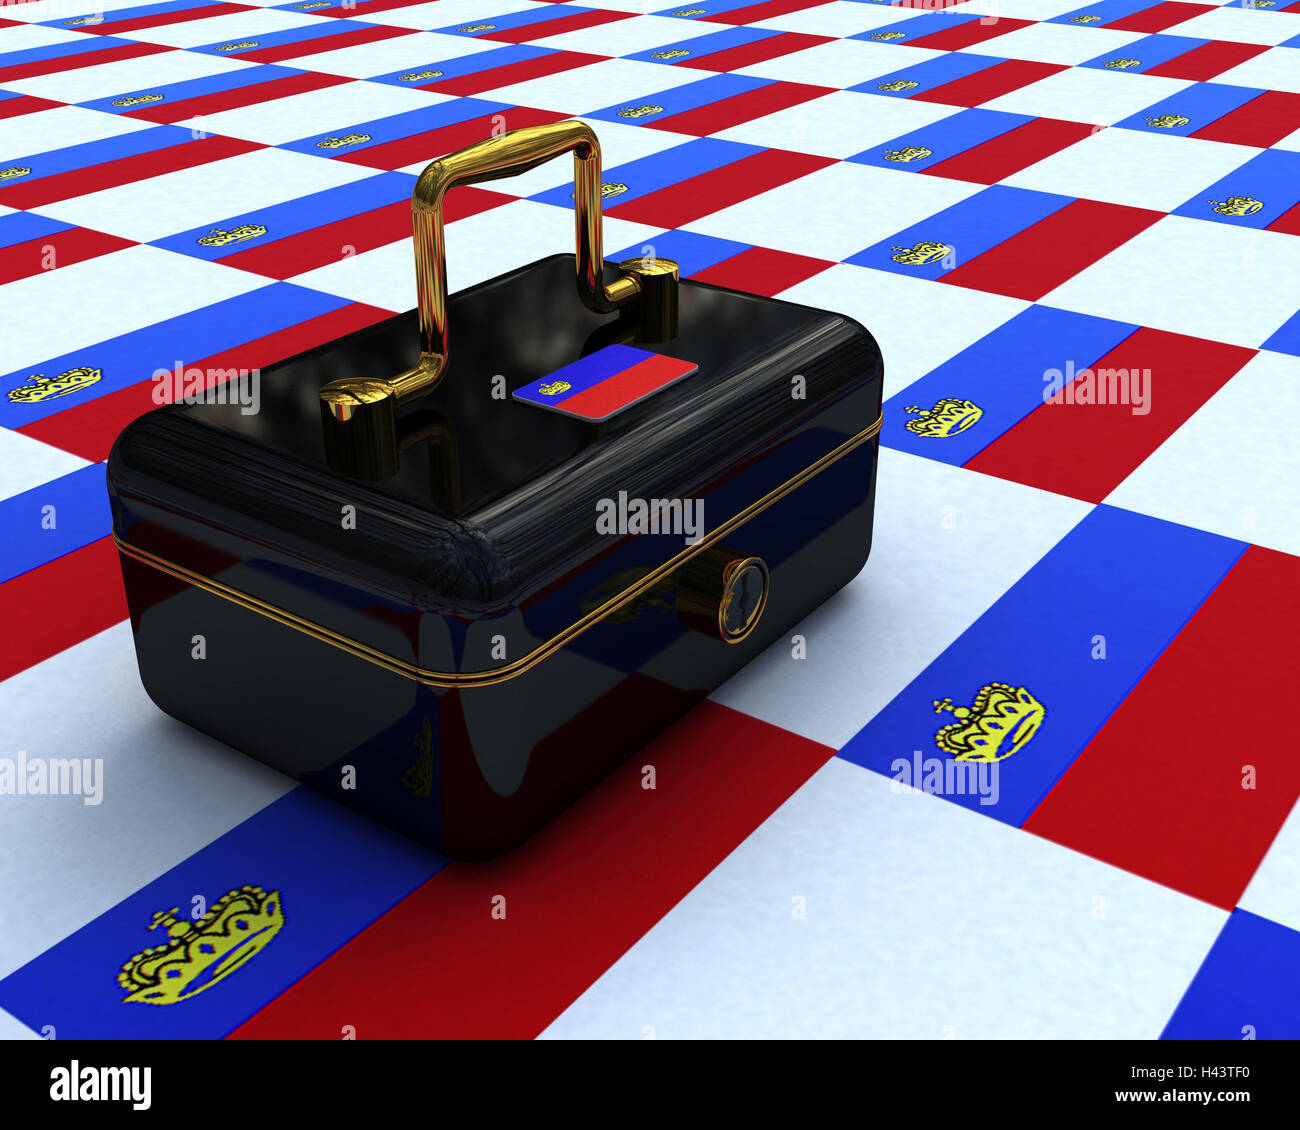 Cashbox, black, coats arms, Liechtenstein, cash box, lockable, banknotes, money, cash, retention, icon, black money, Stock Photo